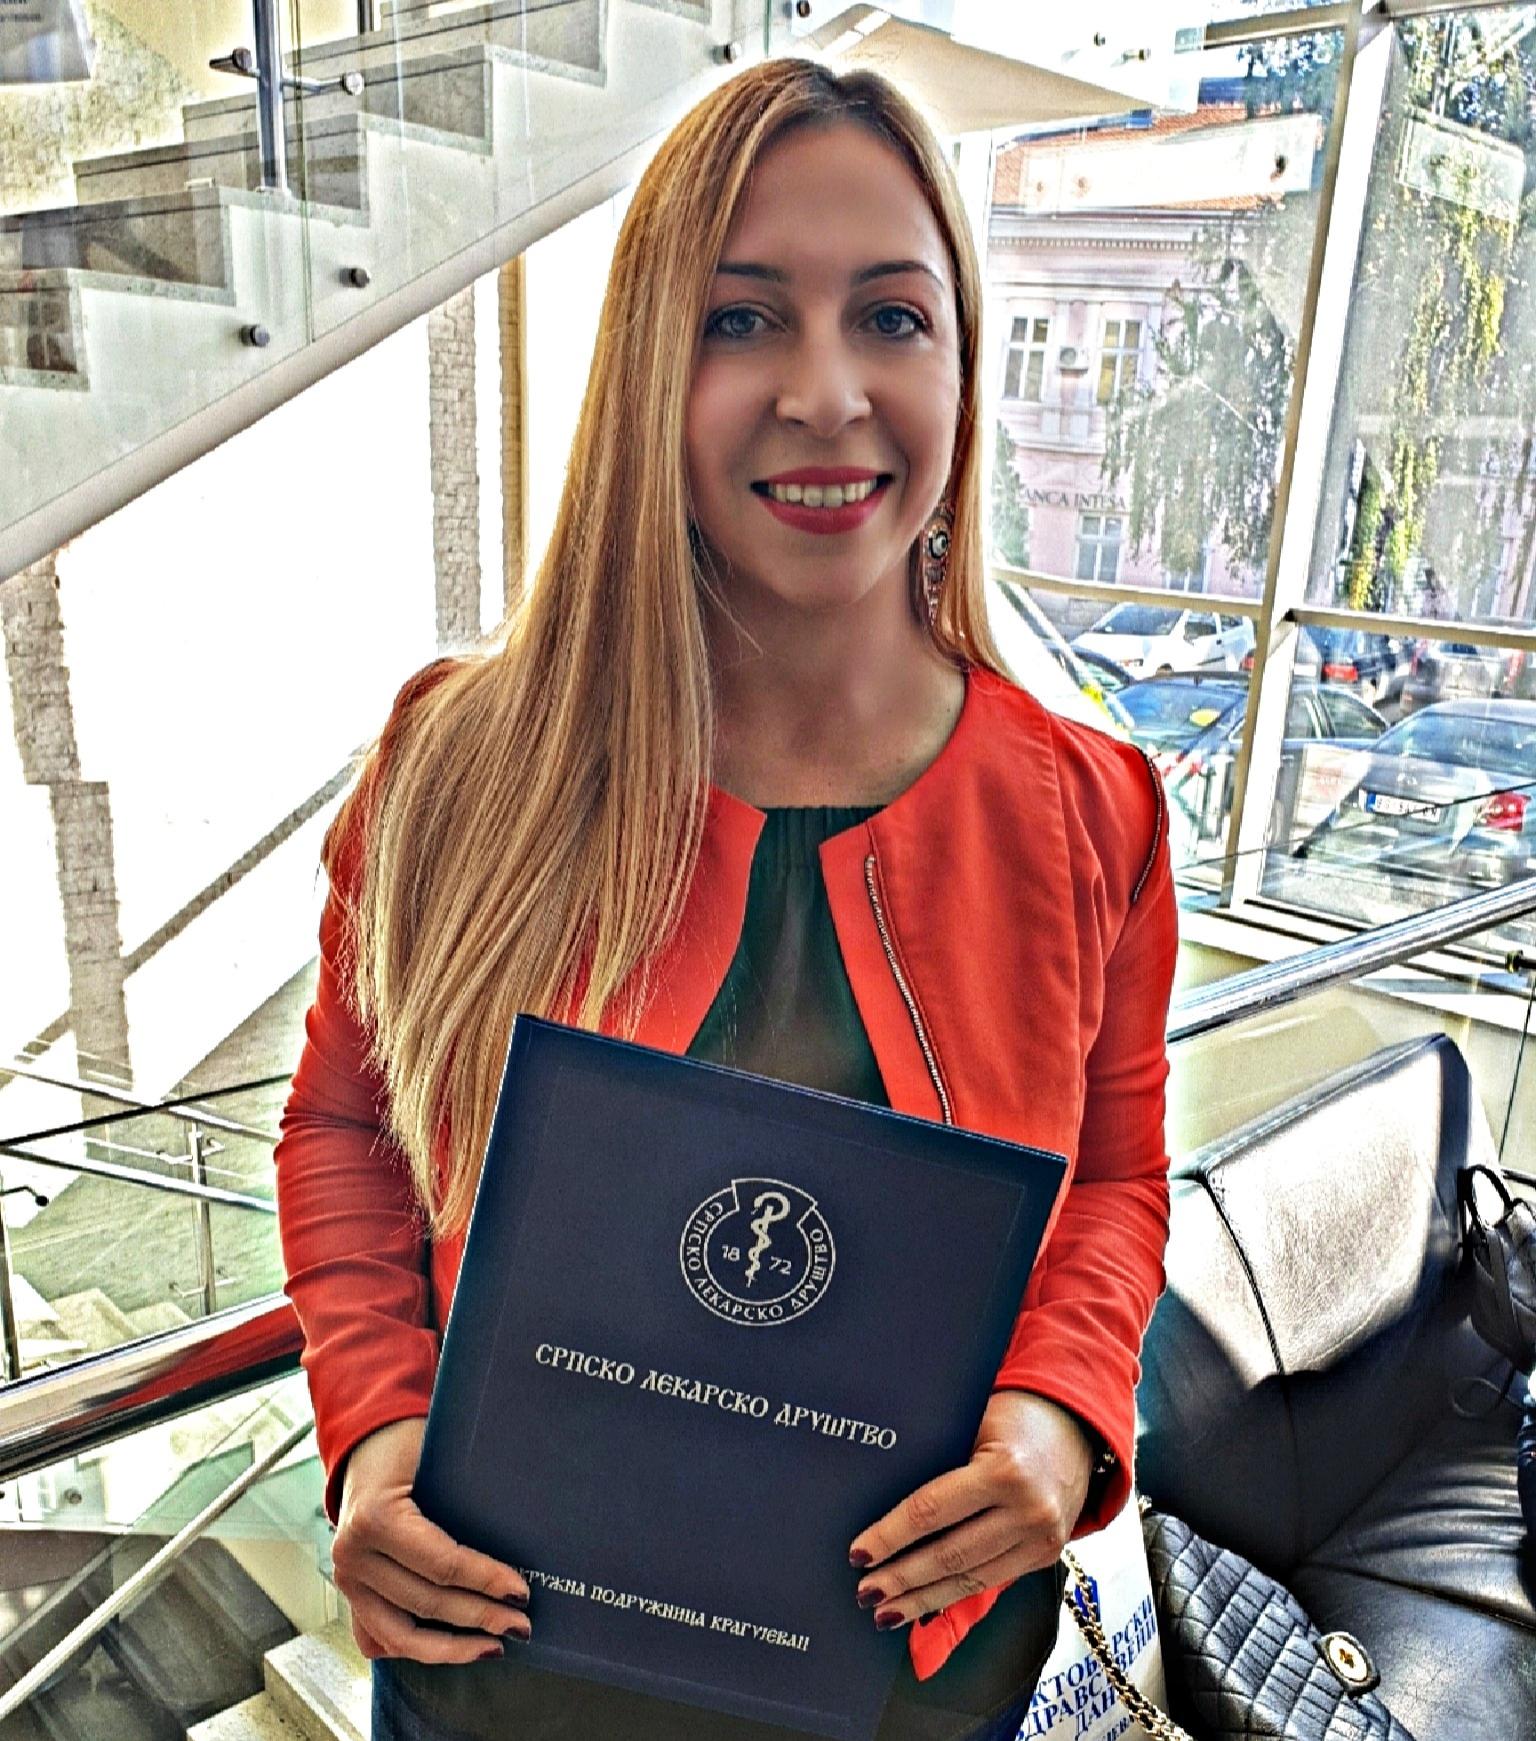 Valentina with Clinical Center Award.